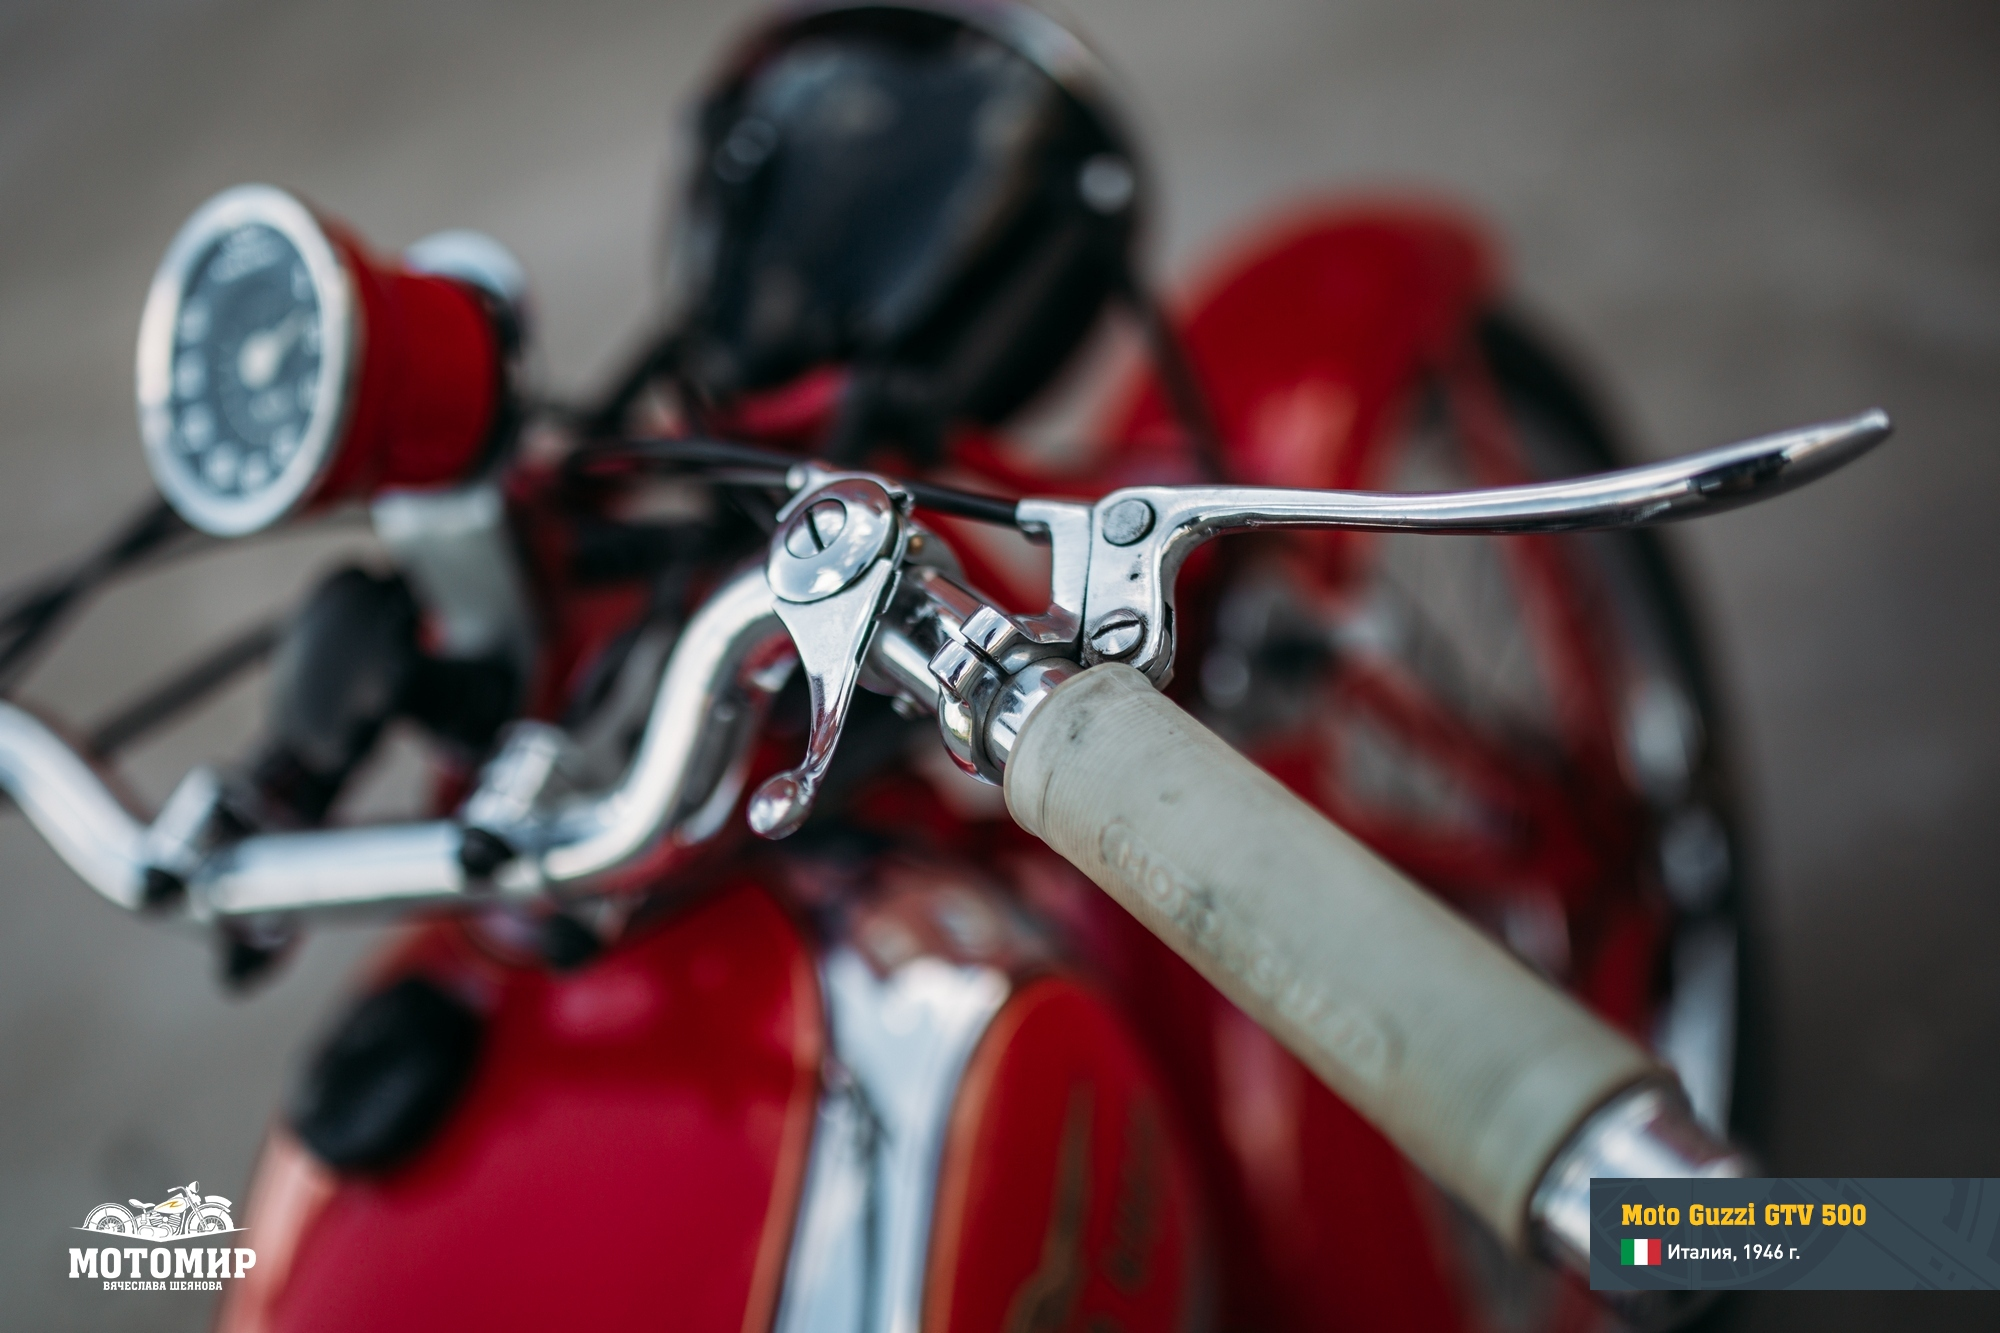 moto-guzzi-gtv-500-201509-web-30